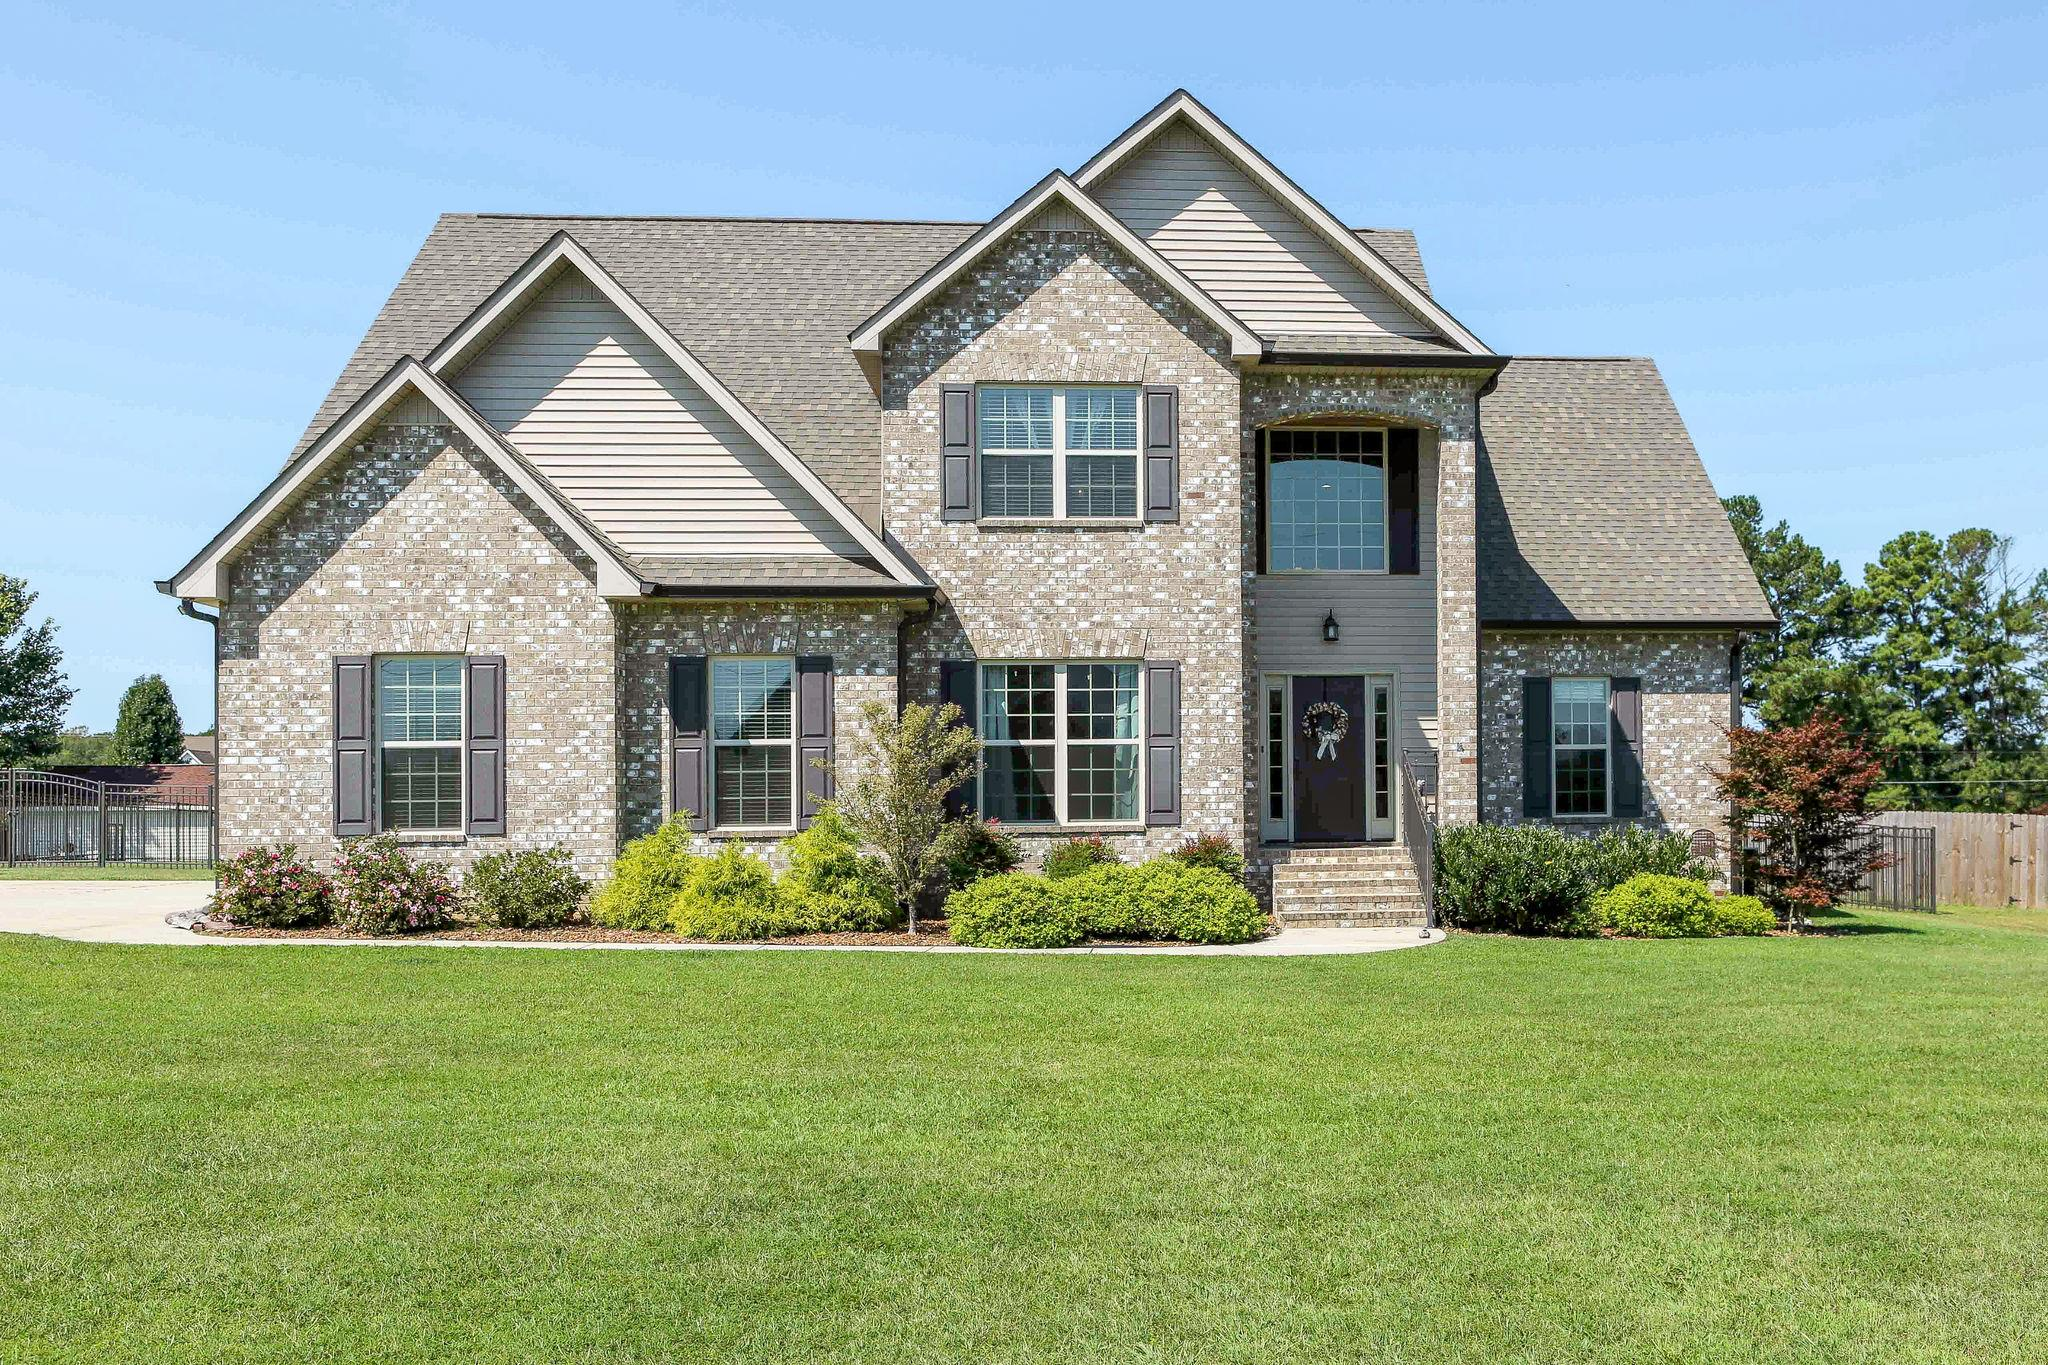 71 Lancaster St, Hillsboro, TN 37342 - Hillsboro, TN real estate listing